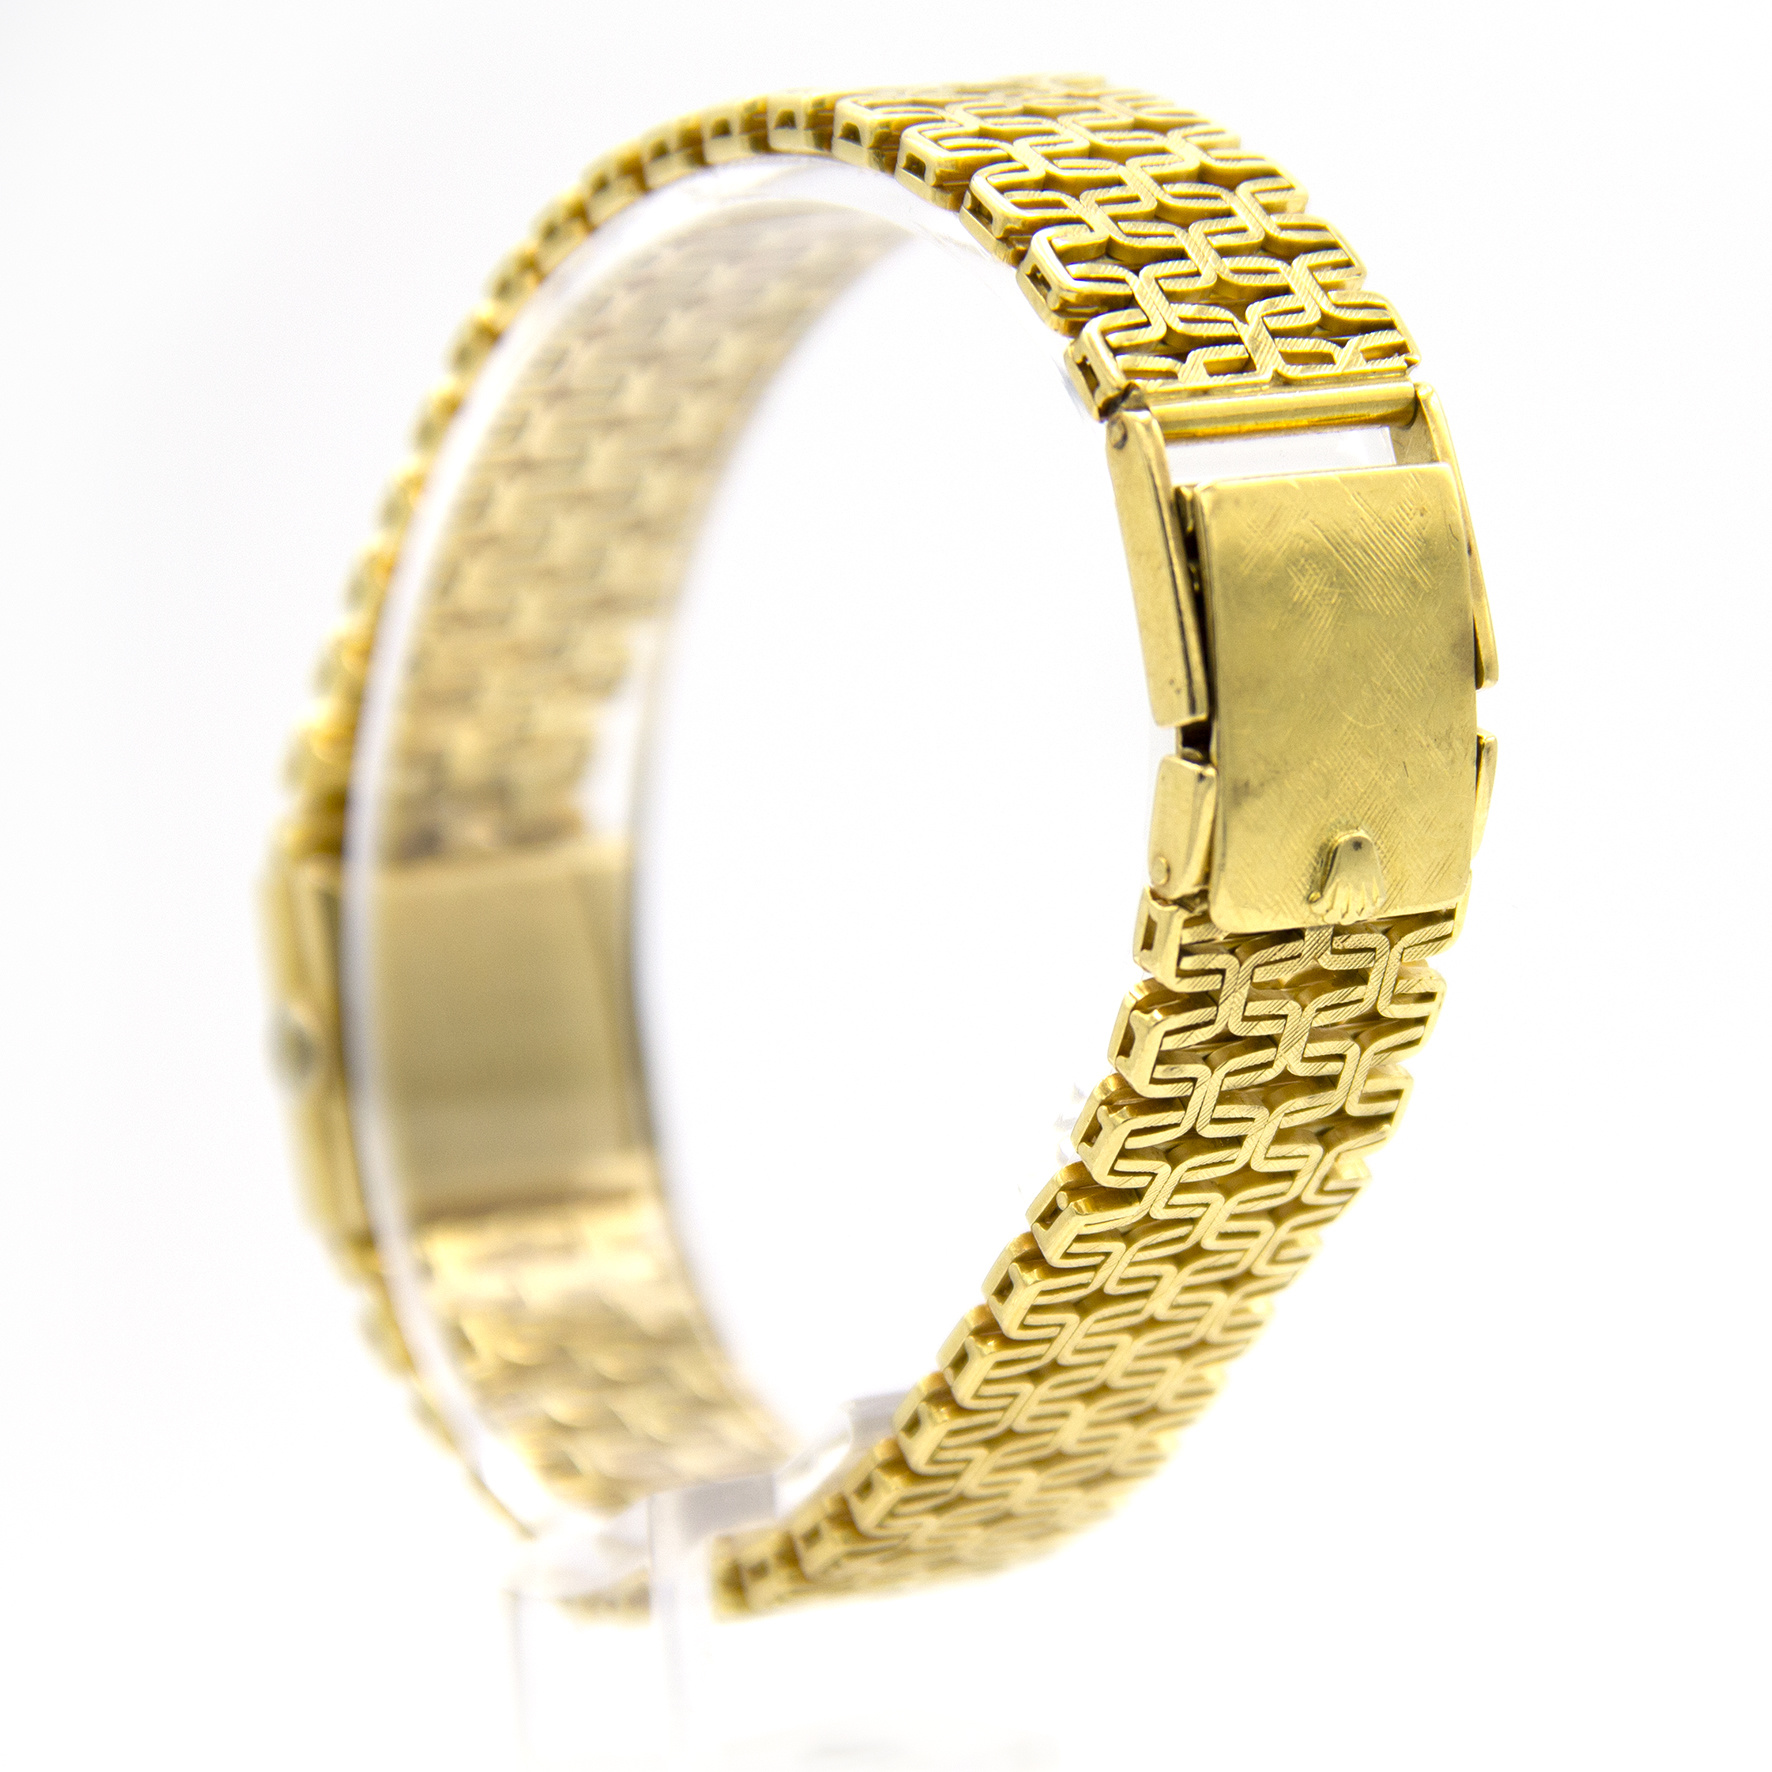 Rolex Precision -  Dames Horloge - 18 karaat geelgoud-6